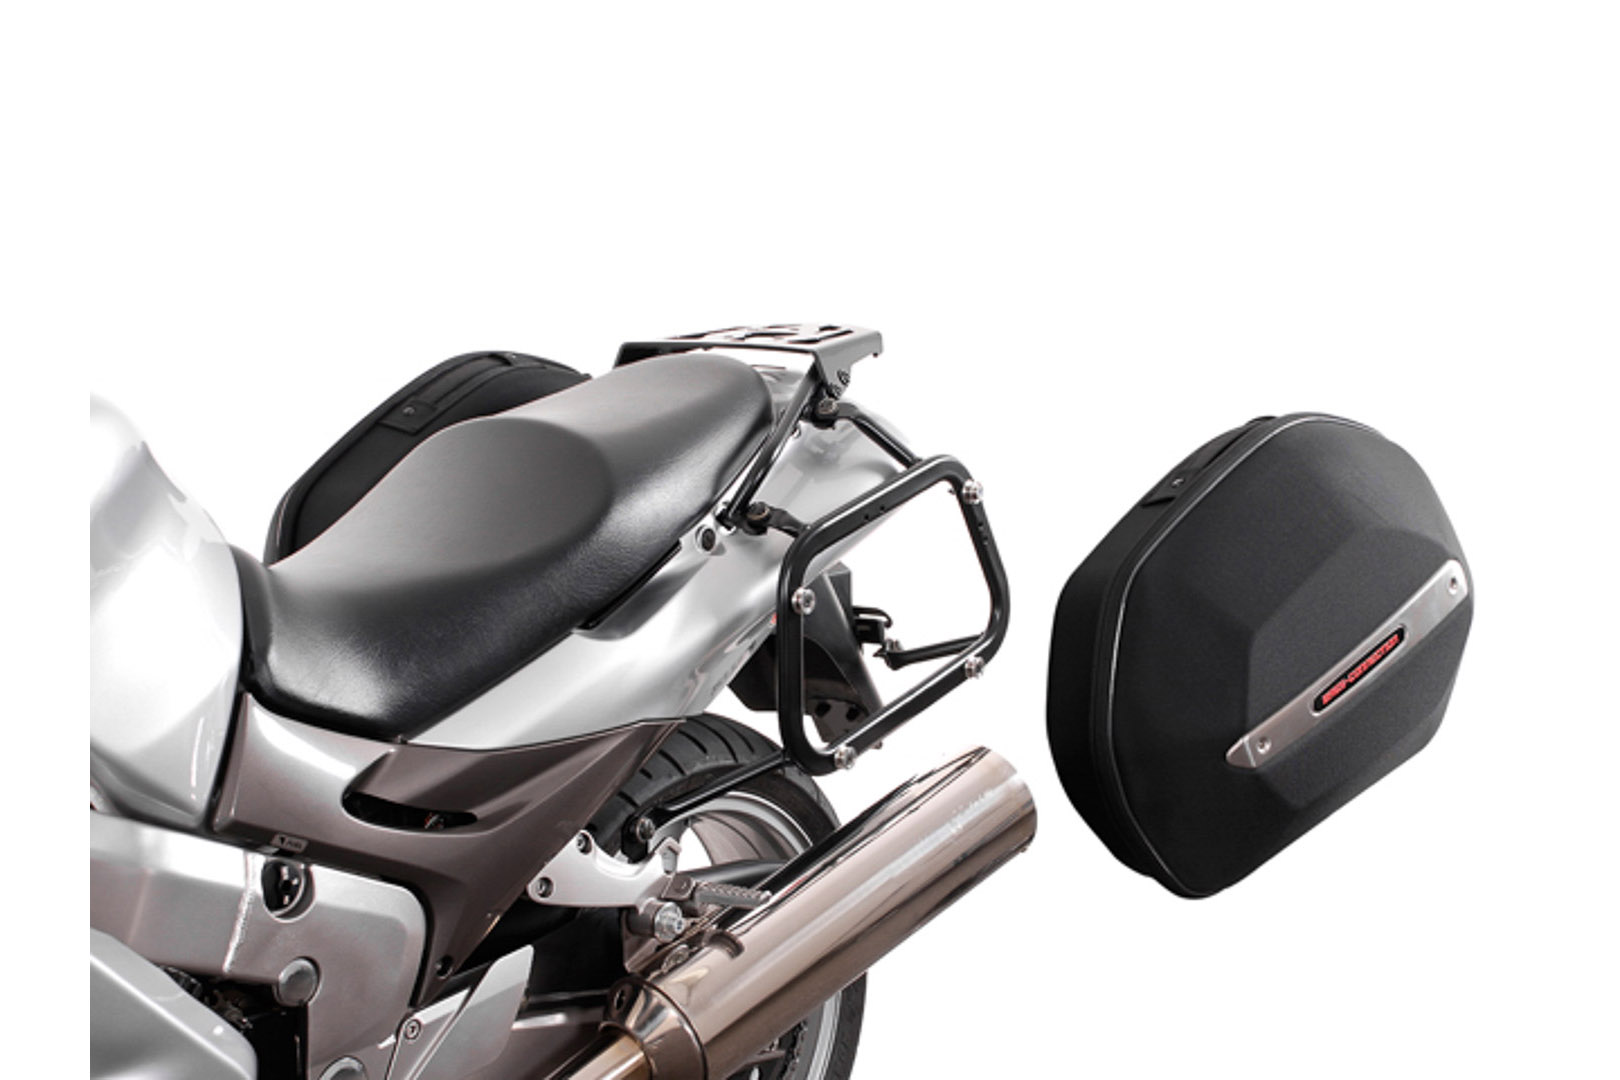 Quick-Lock Evo sivutelinesarja Kawasaki ZZR1200 02-06